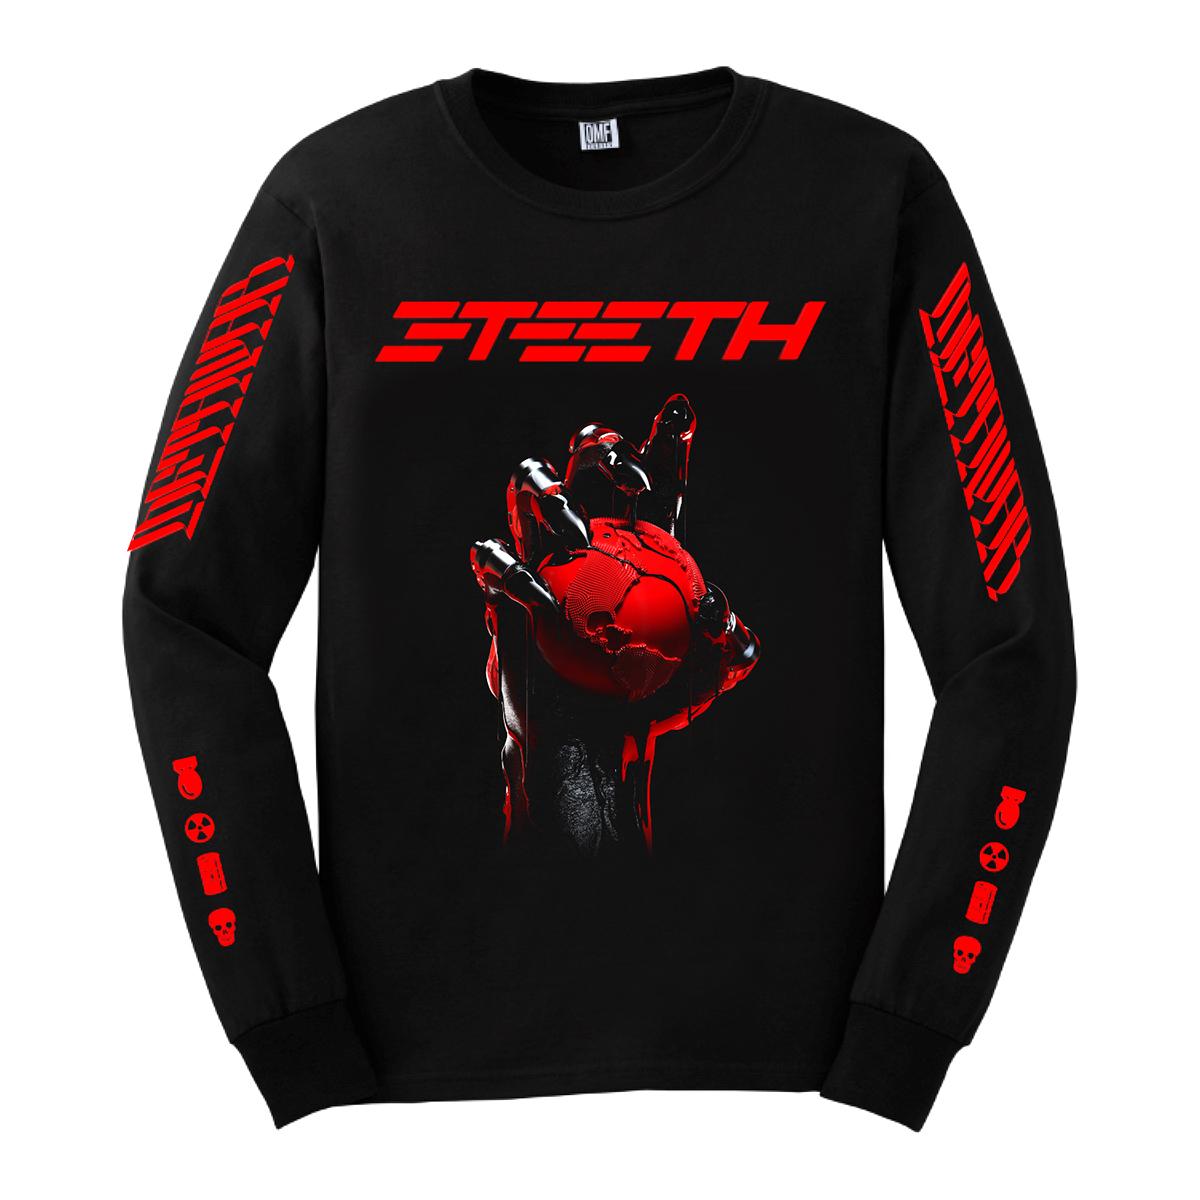 3TEETH - METAWAR Long Sleeve Black T-shirt